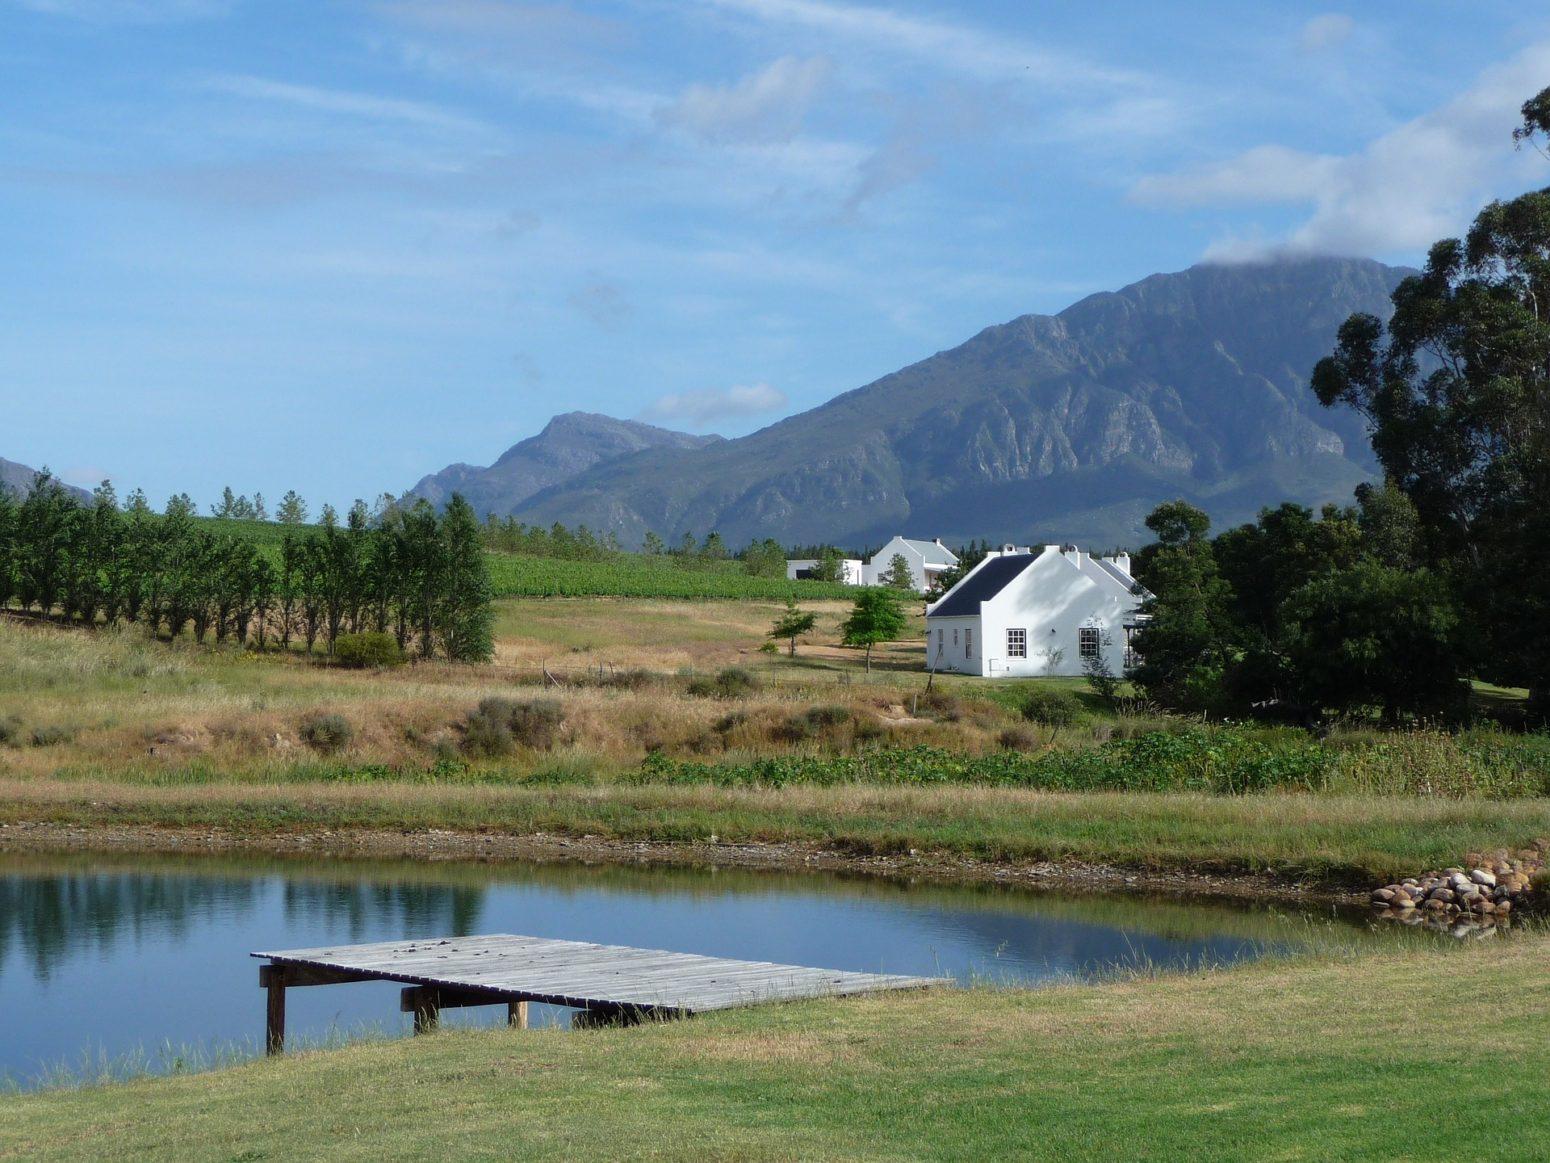 Cape Winelands South Africa